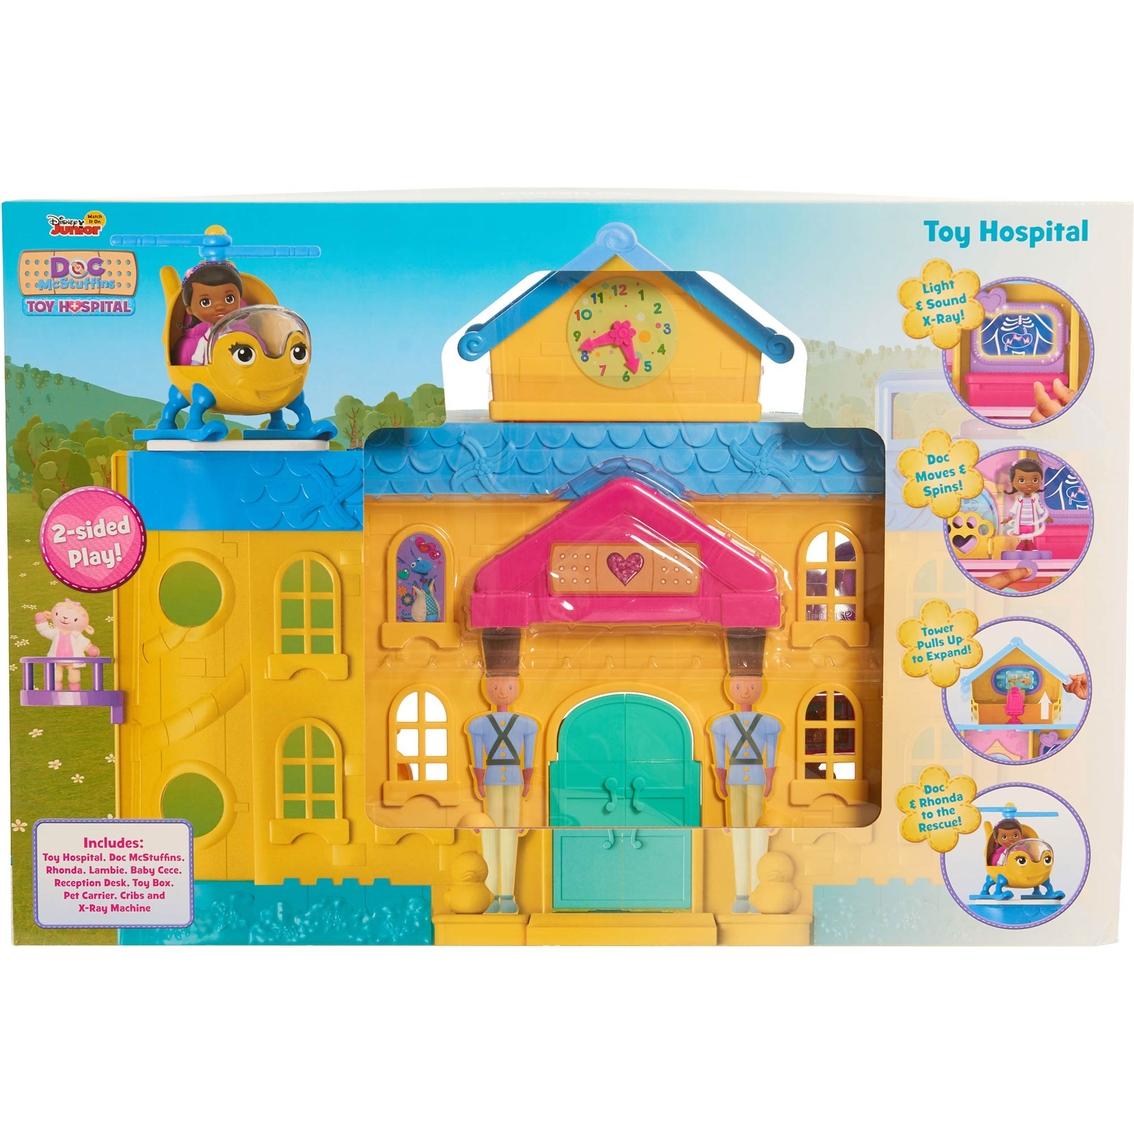 Disney Junior Doc Mcstuffins Toy Hospital Playset Action Figures Baby Toys Shop The Exchange